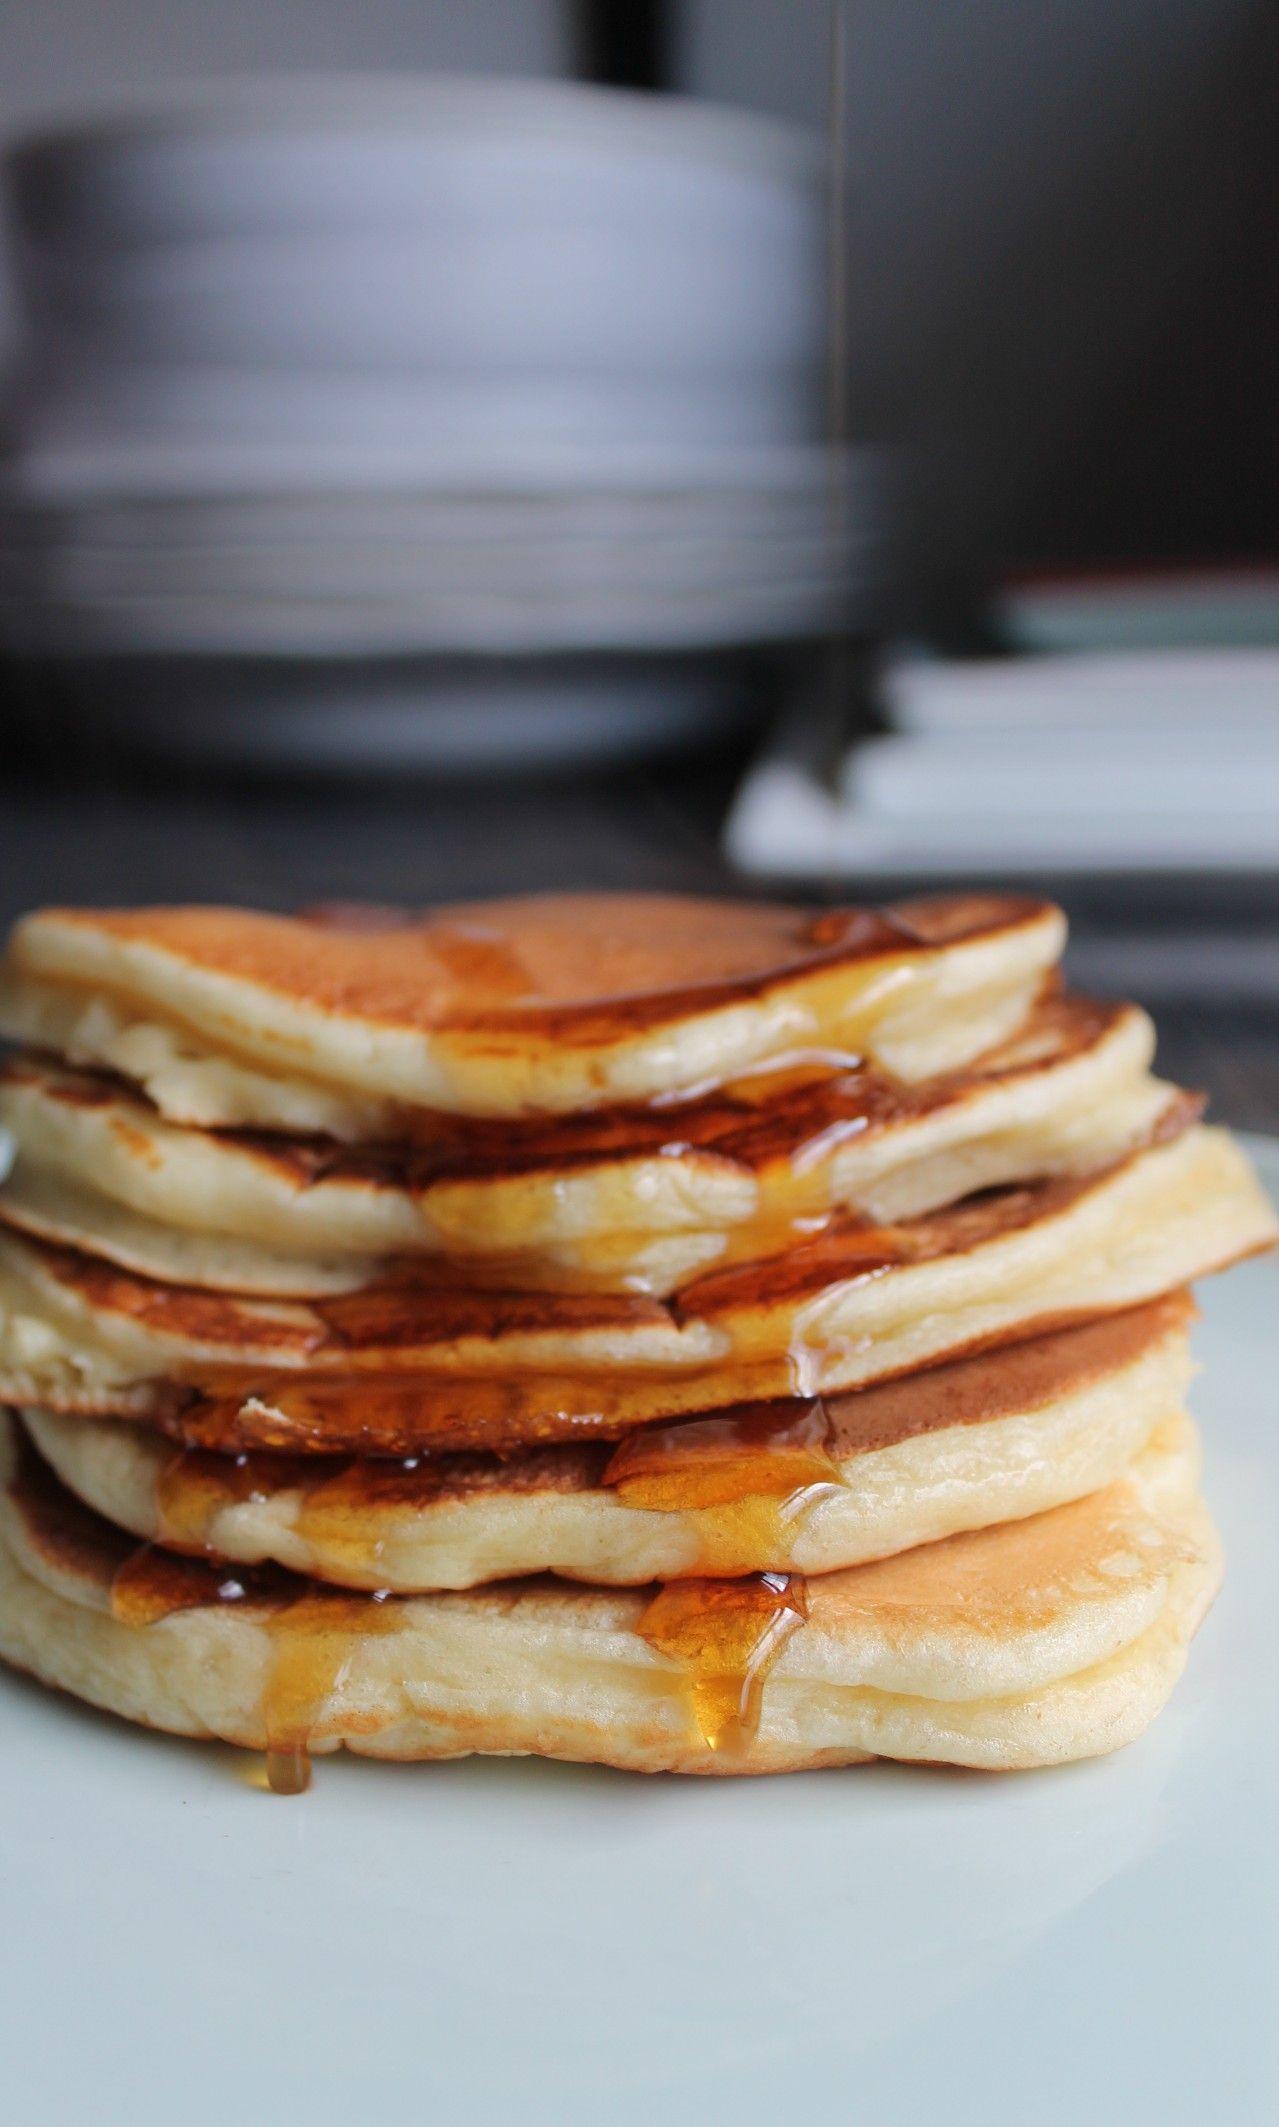 Buttermilk Pancakes Foodie Hub Daniel Diver Recipe In 2020 Buttermilk Pancakes Pancakes Buttermilk